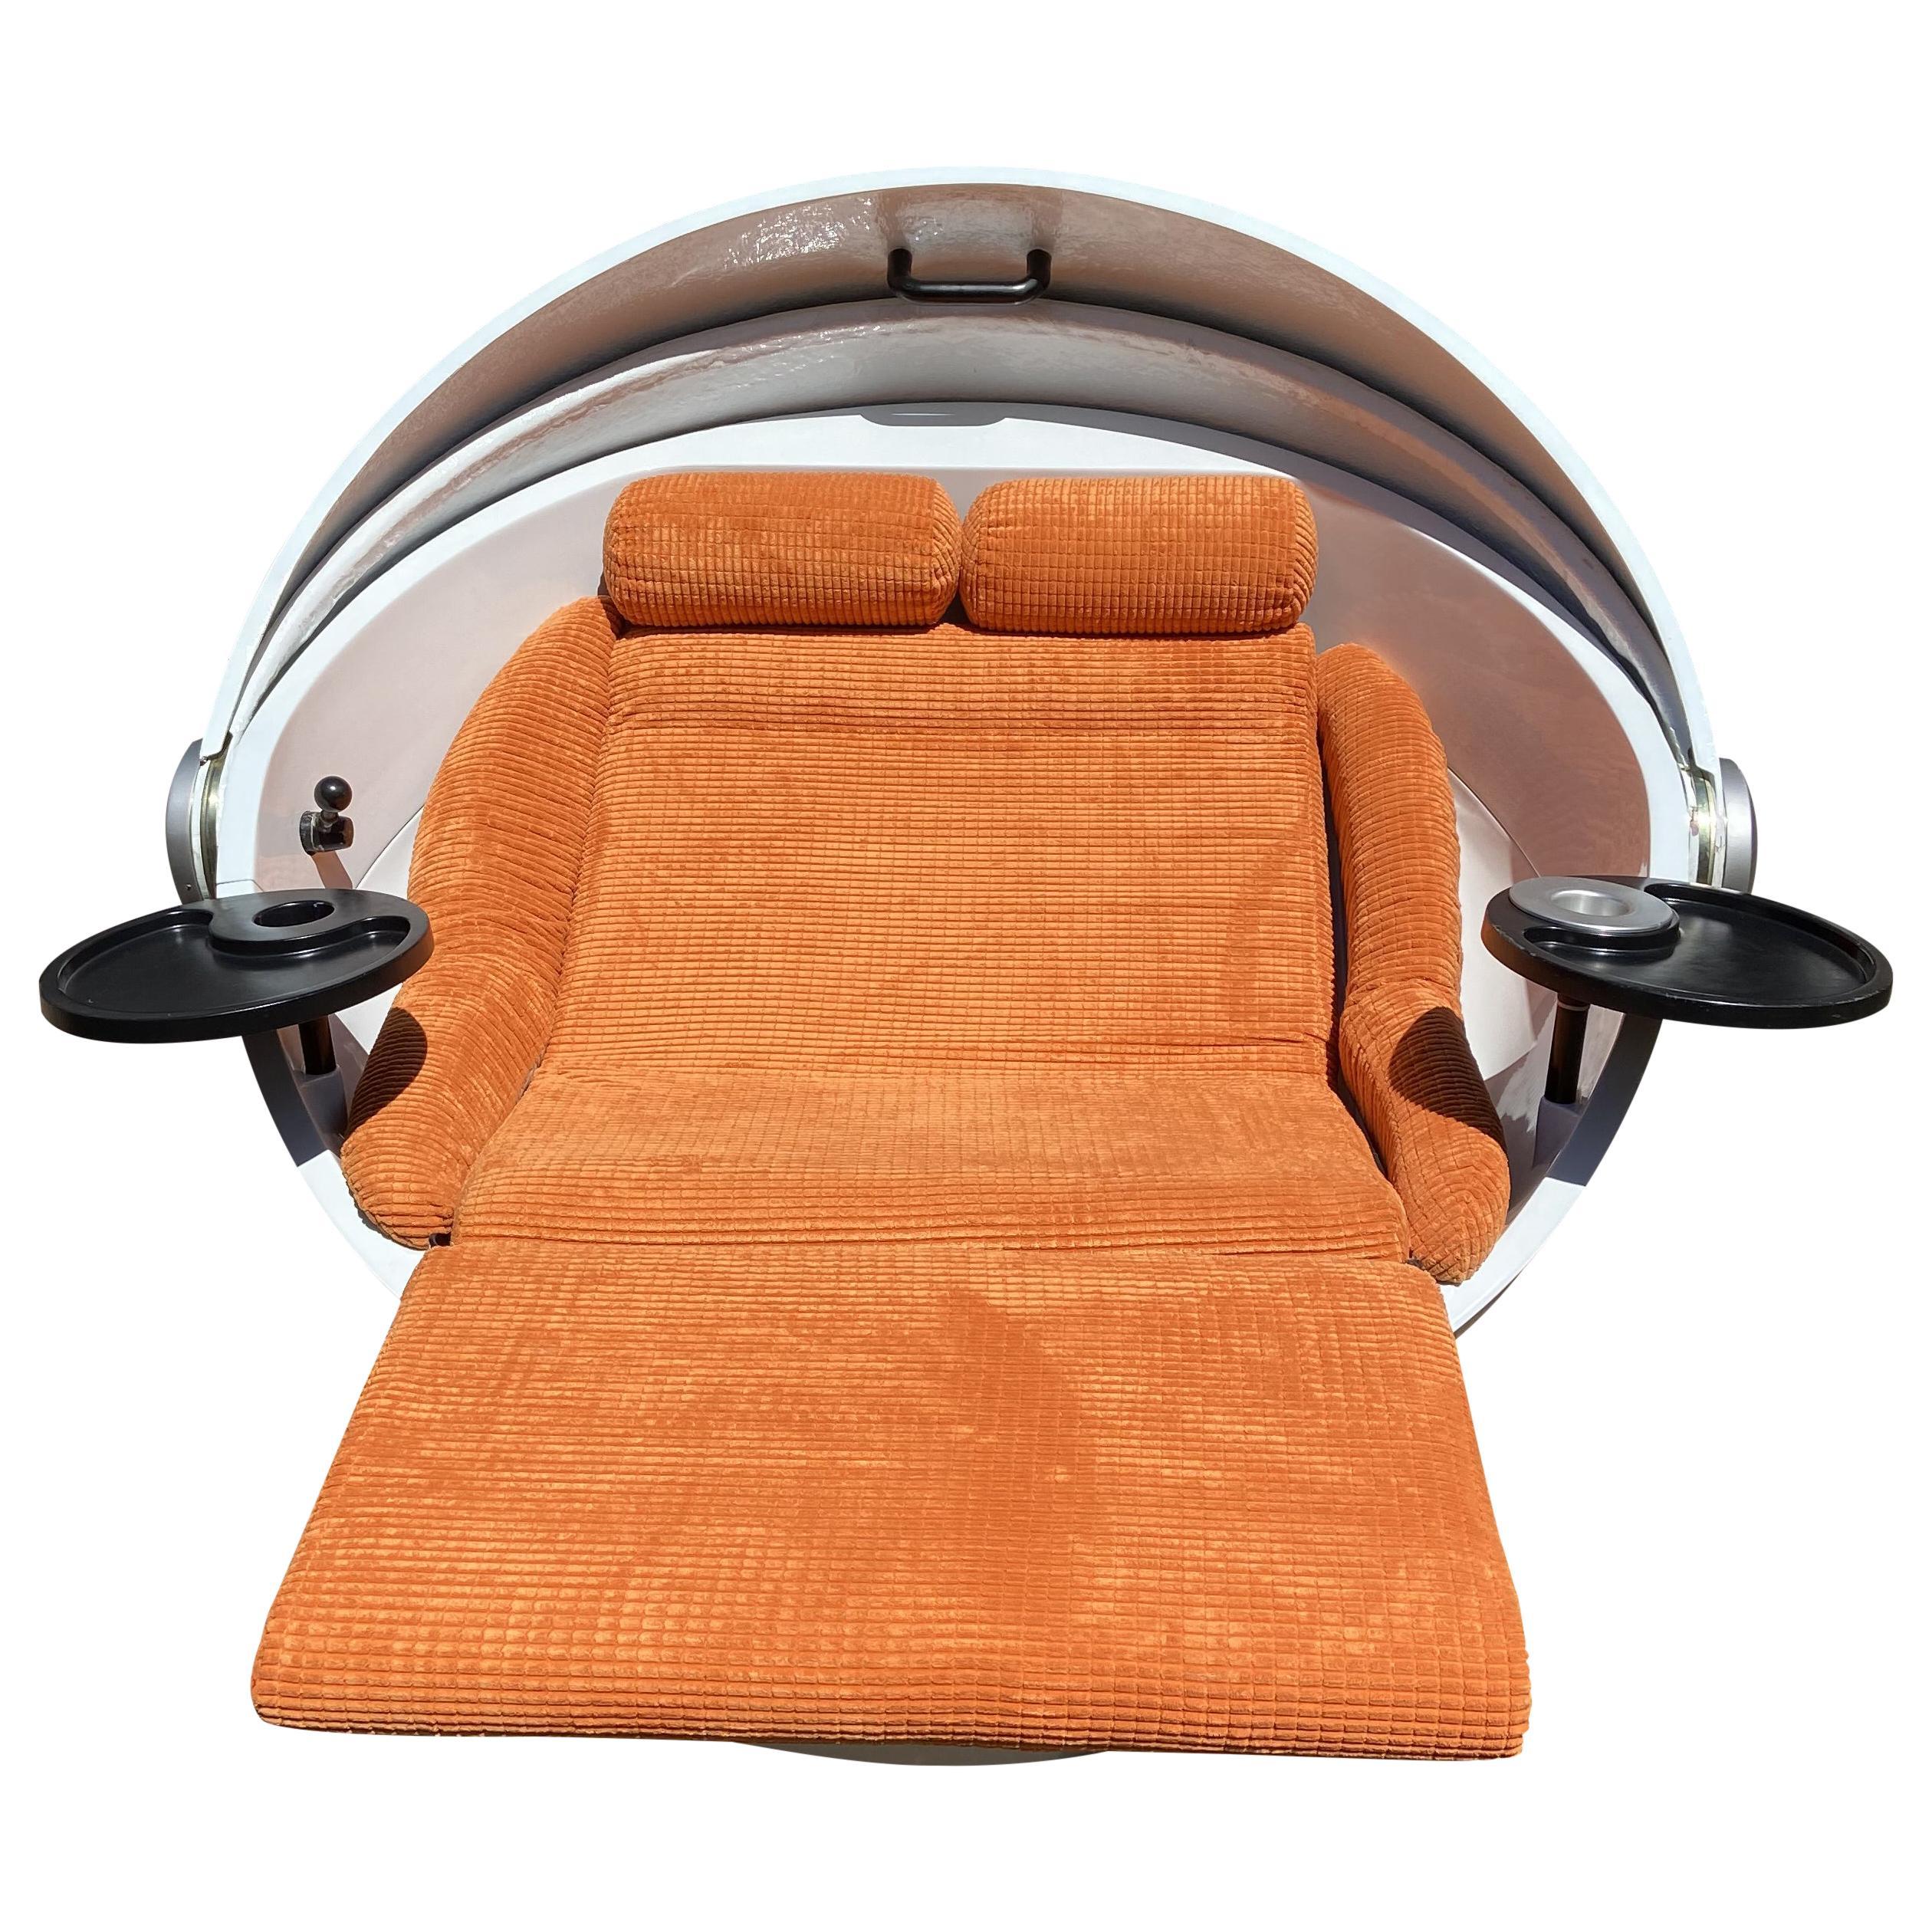 Original Sunball Chair by Gunter Ris and Ferdinand Selldorf for Rosenthal